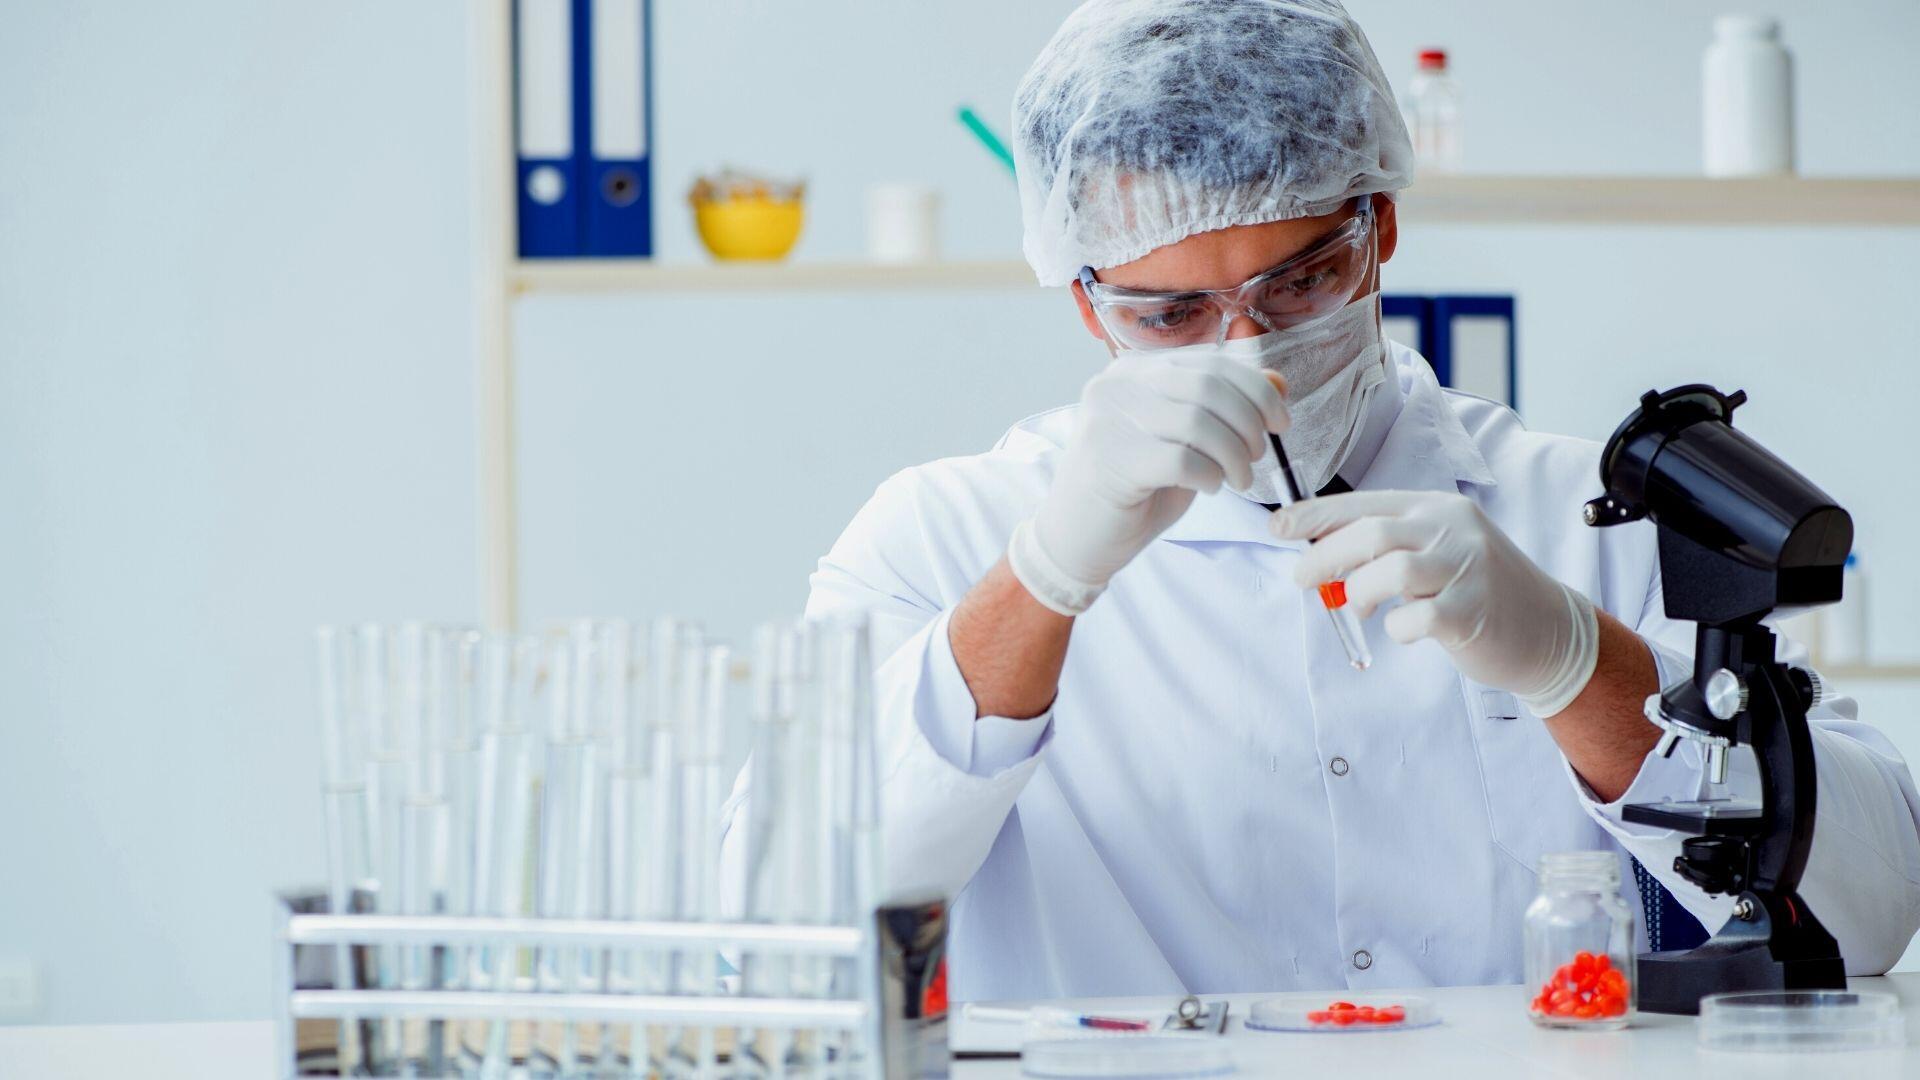 zaburzona rownowaga plci w testowaniu lekow